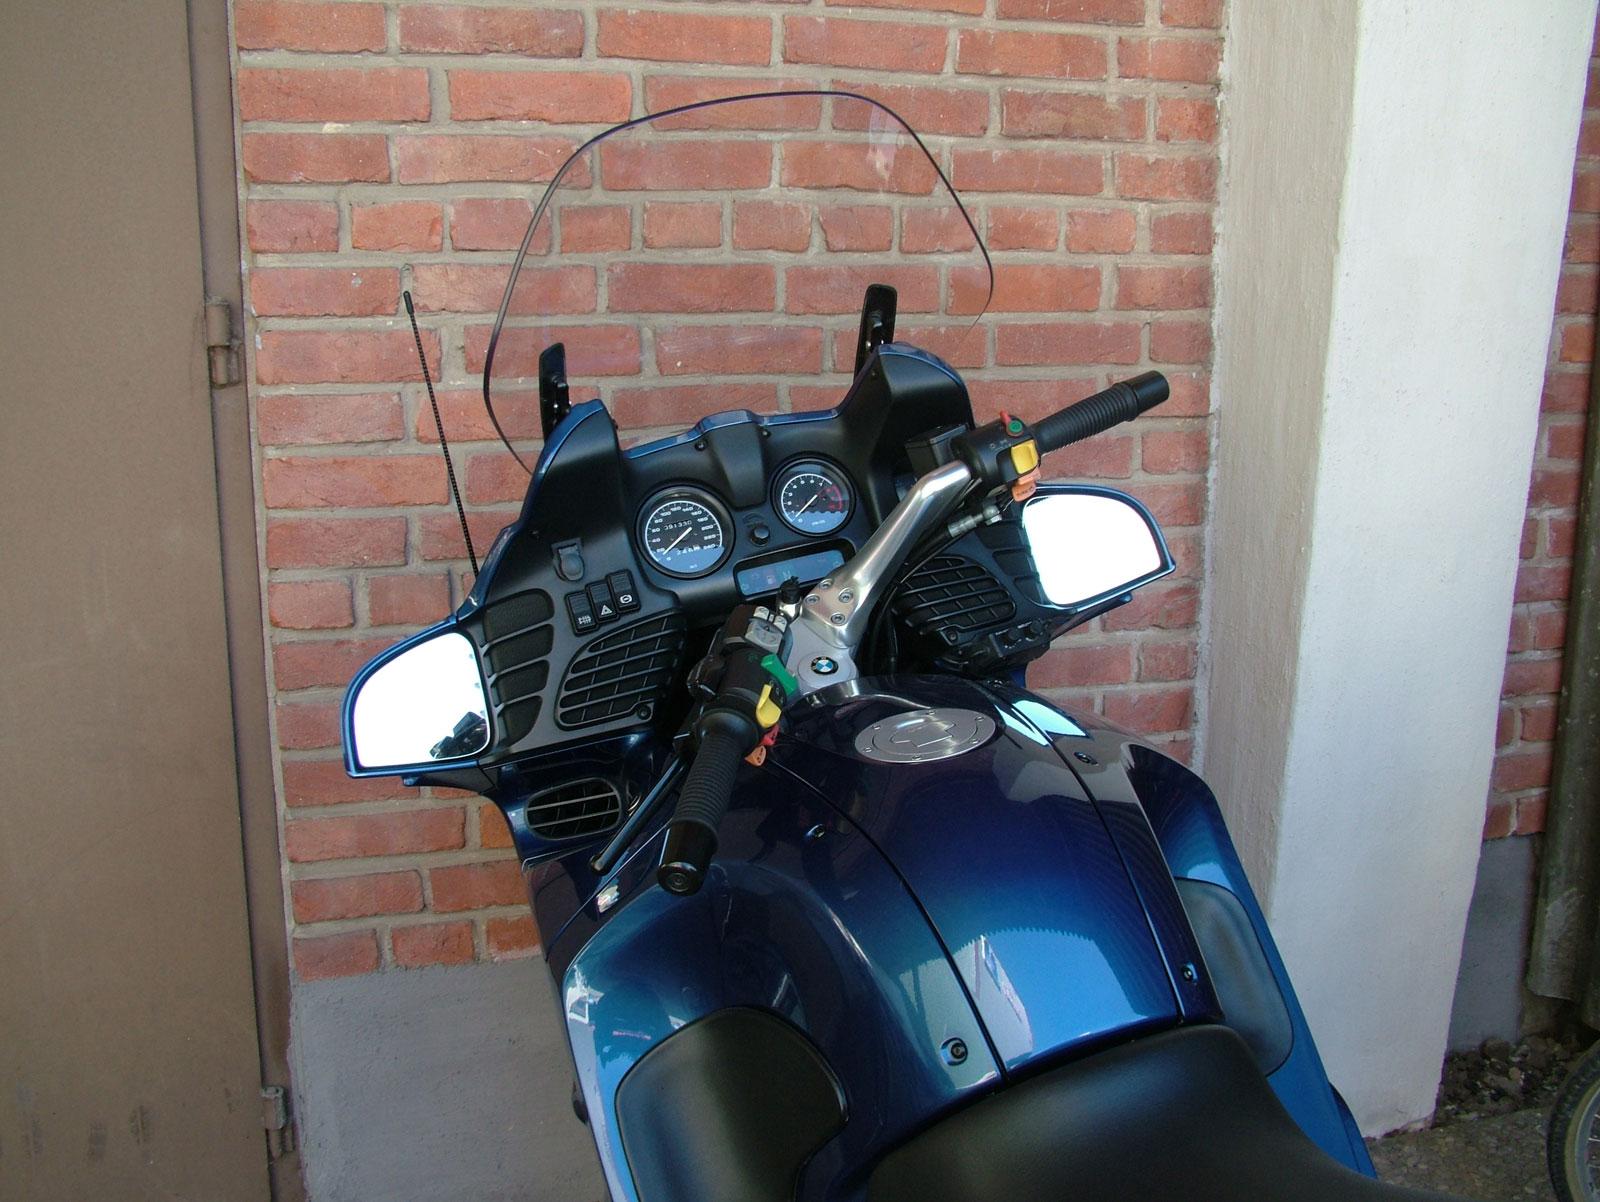 Motorcycle, Bike, Blue, HQ Photo